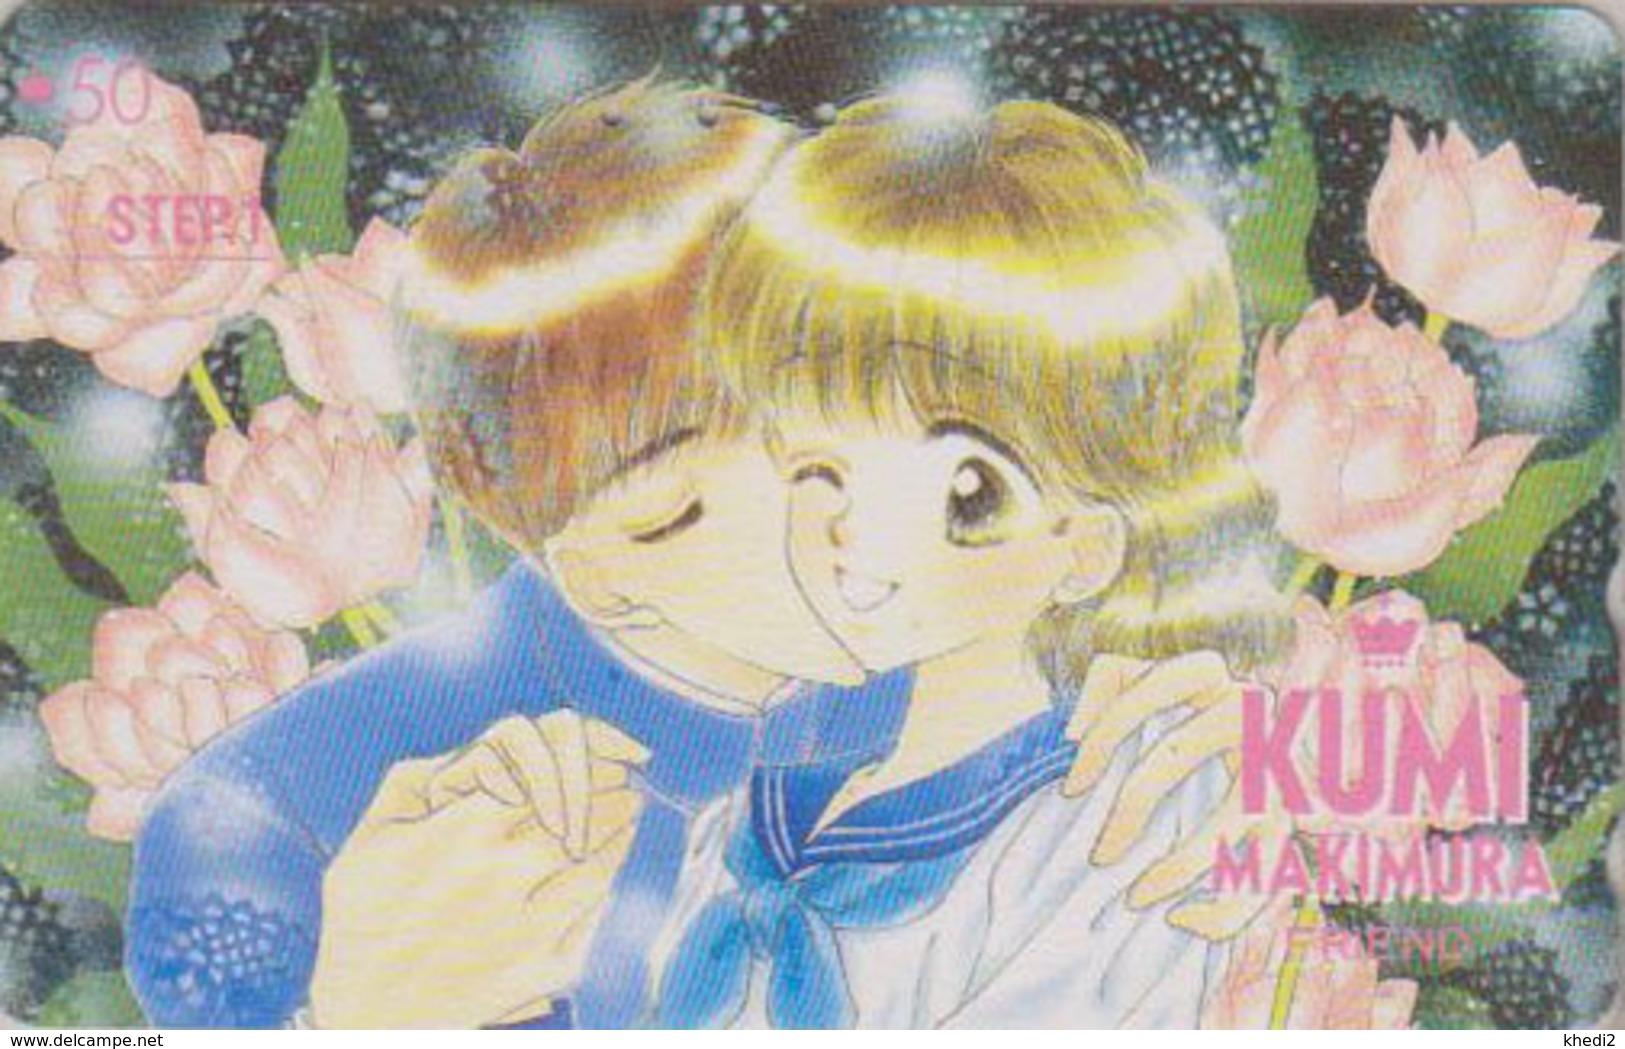 Télécarte Japon / 110-011 - MANGA - FRIEND By KUMI MAKIMURA * STEP 1 * - ANIME Japan Phonecard - BD COMICS TK - 9653 - BD